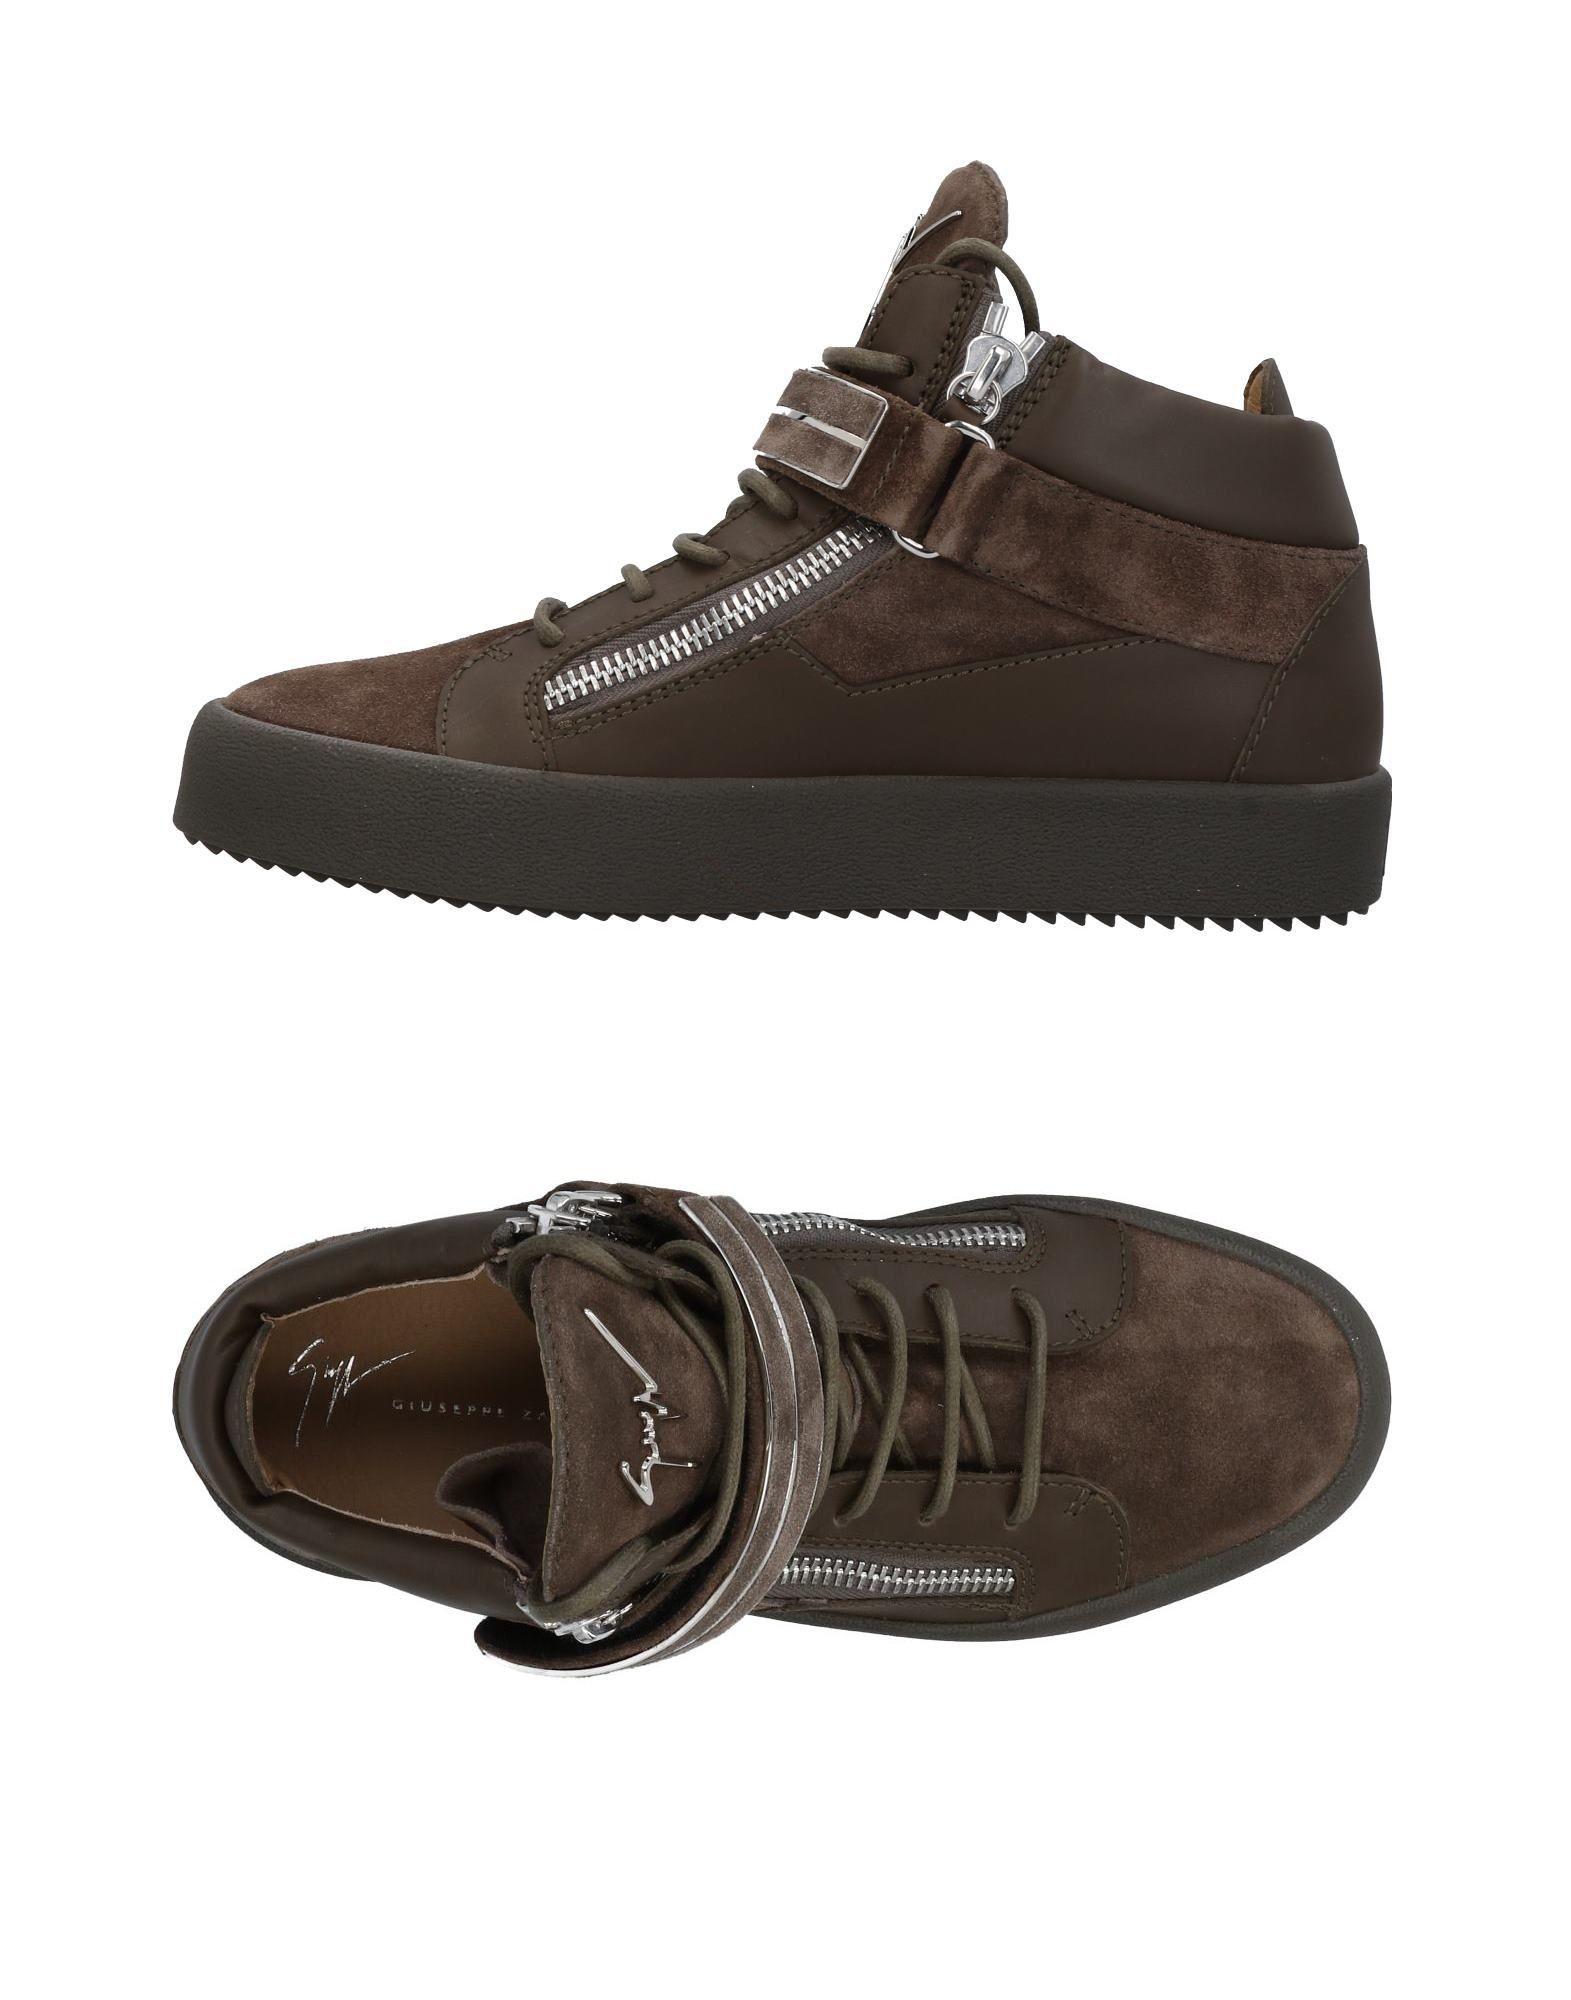 Sneakers Giuseppe Zanotti Homme - Sneakers Giuseppe Zanotti  Vert militaire Remise de marque